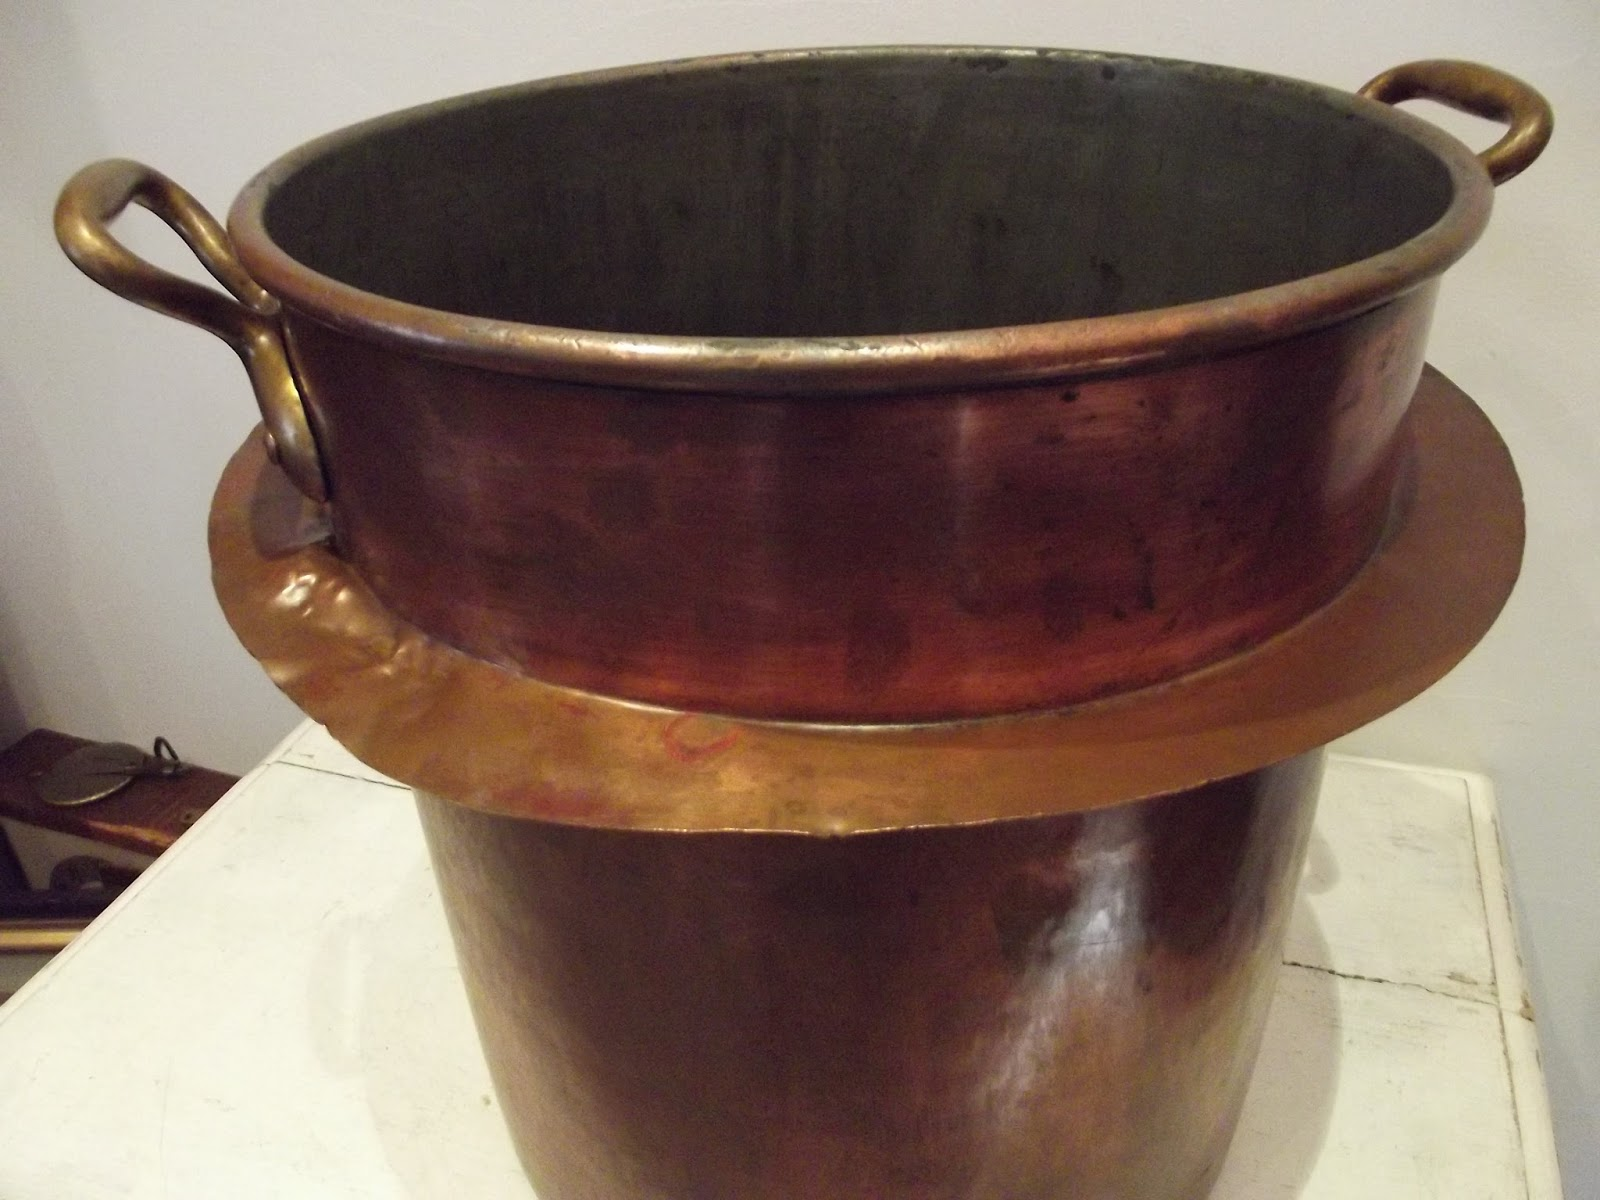 very big antique french copper pan casserole uge saucepan tinned copper pot xxxl ebay. Black Bedroom Furniture Sets. Home Design Ideas